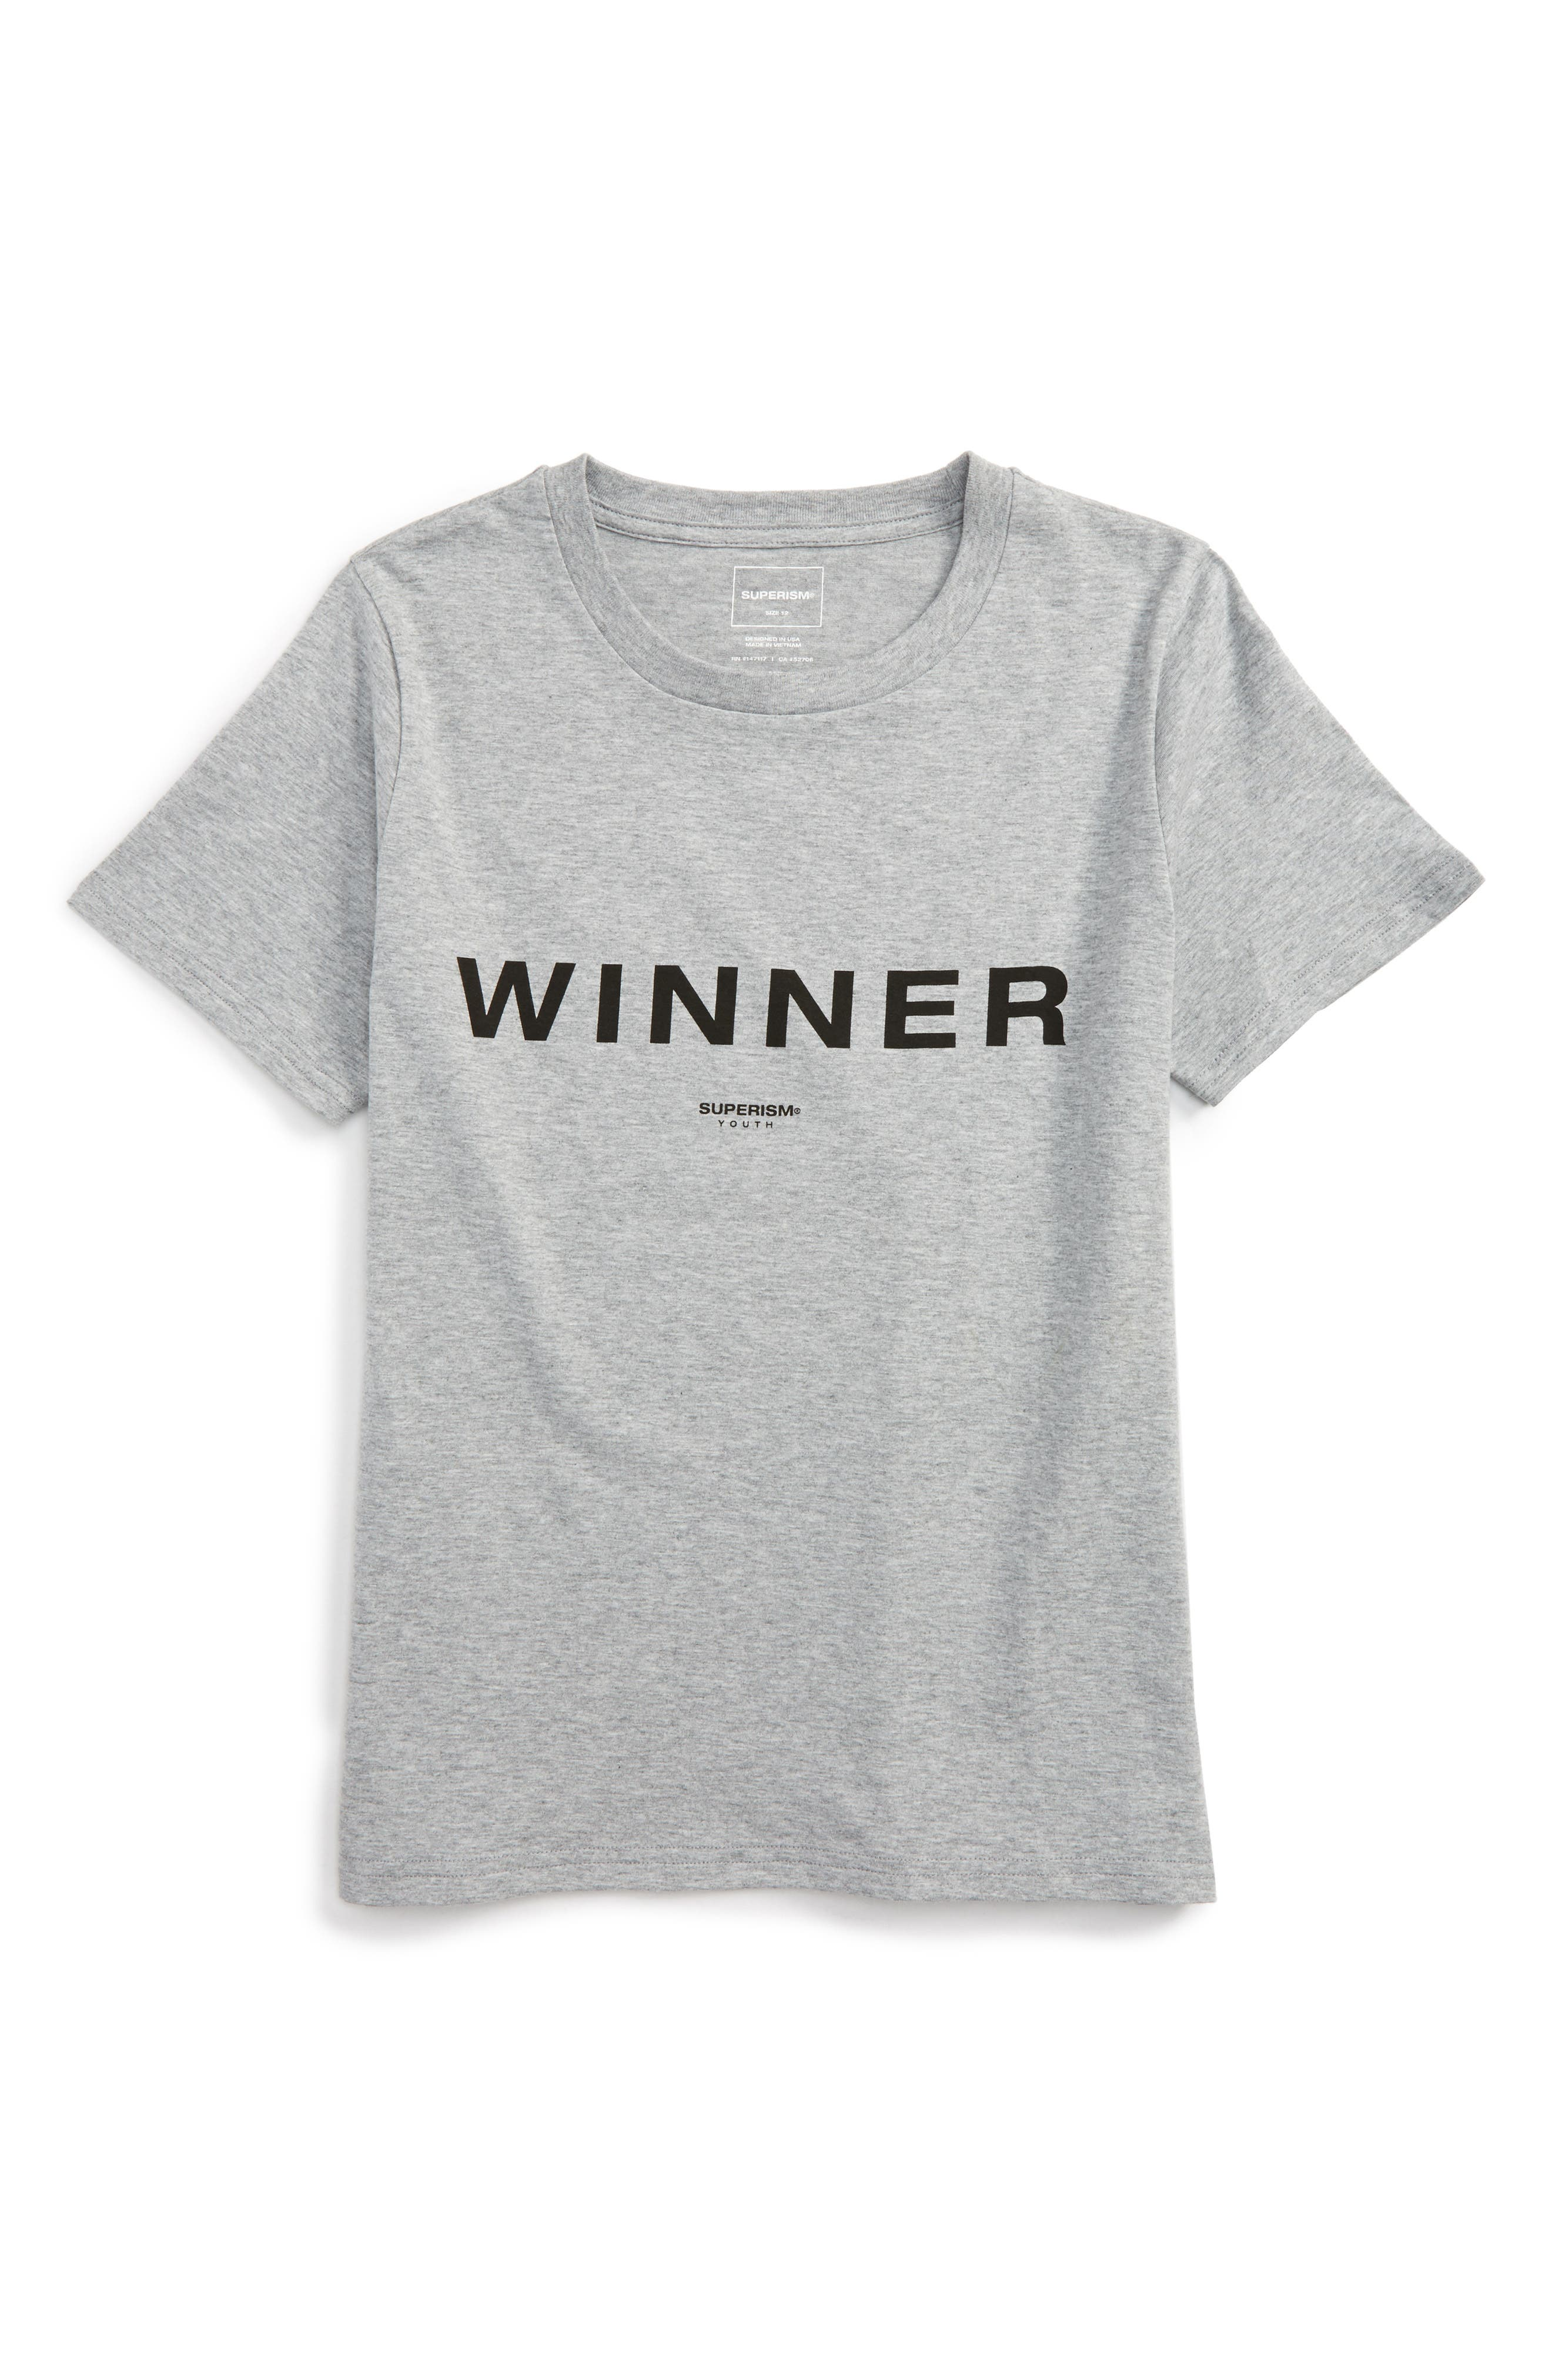 Winner T-Shirt,                             Main thumbnail 1, color,                             Grey Heather